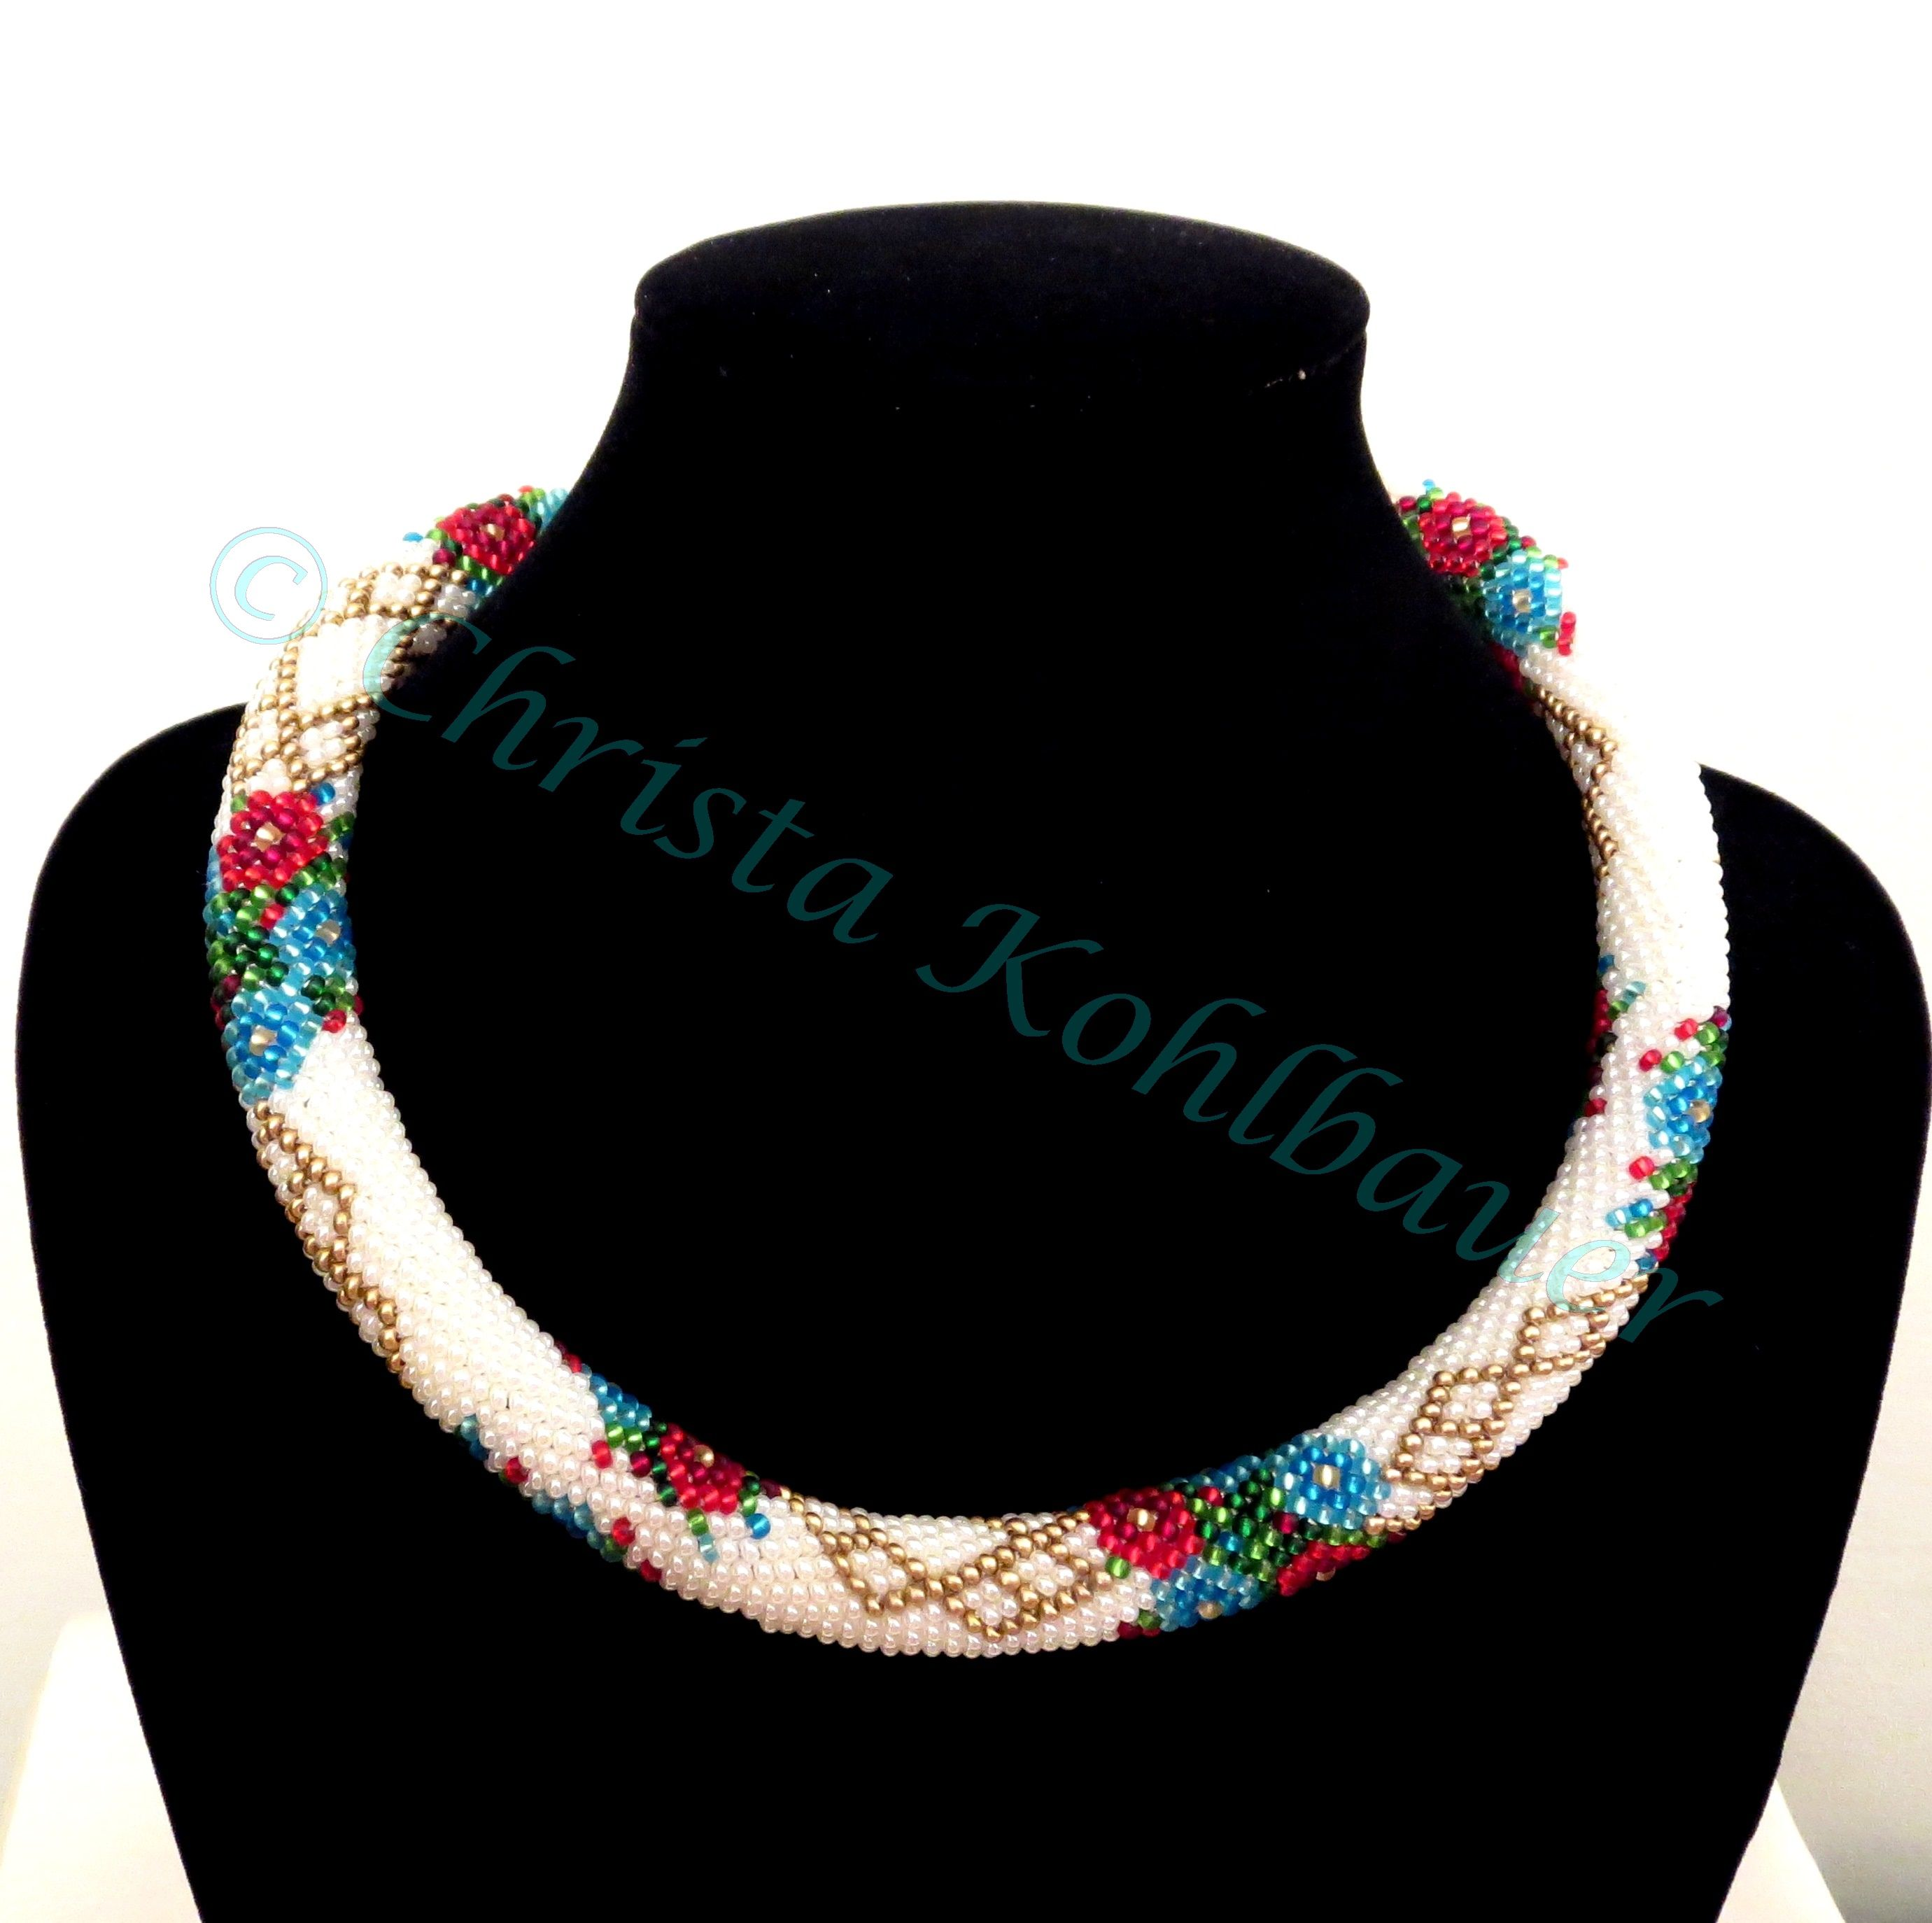 Beads Crochet Christa Kohlbauer | My Beadwork | Pinterest ...